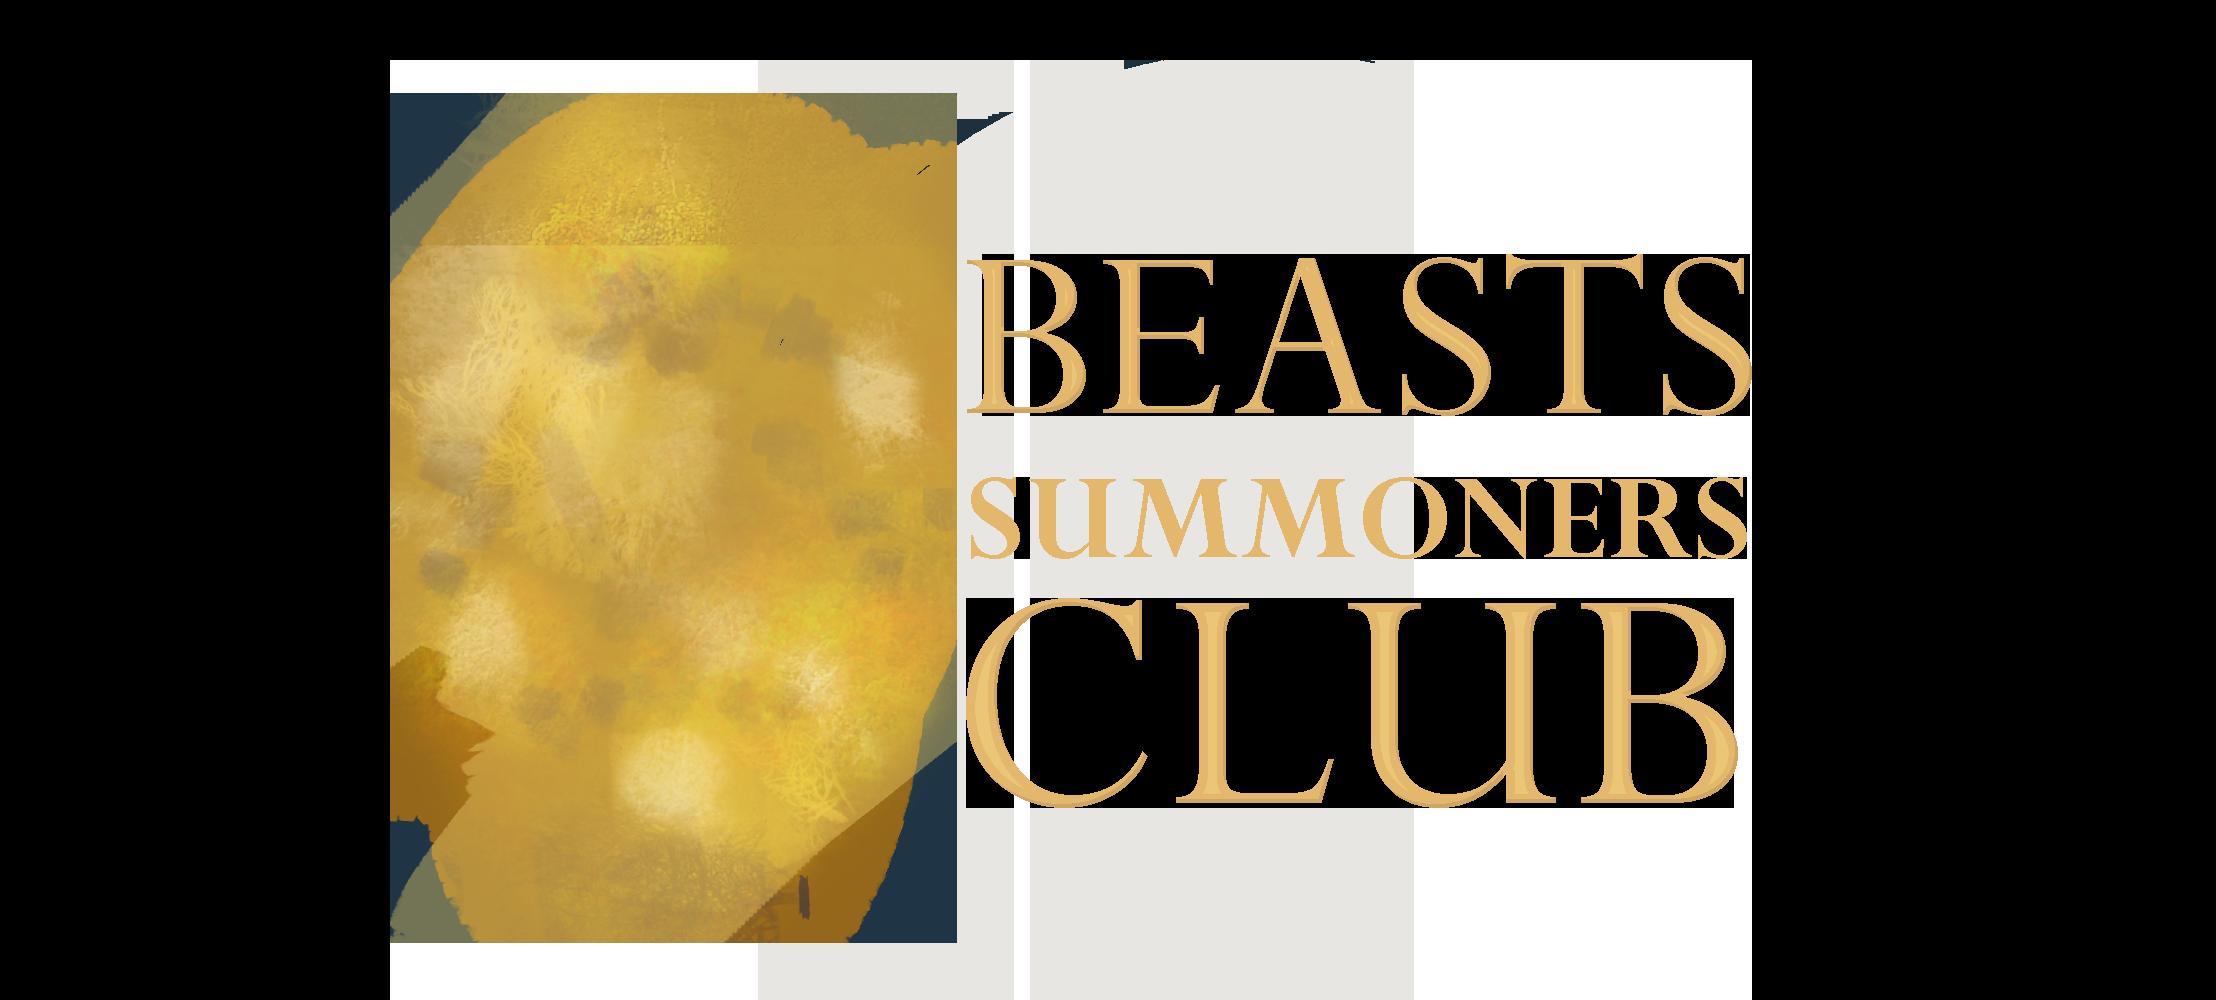 Beasts Summoners Club